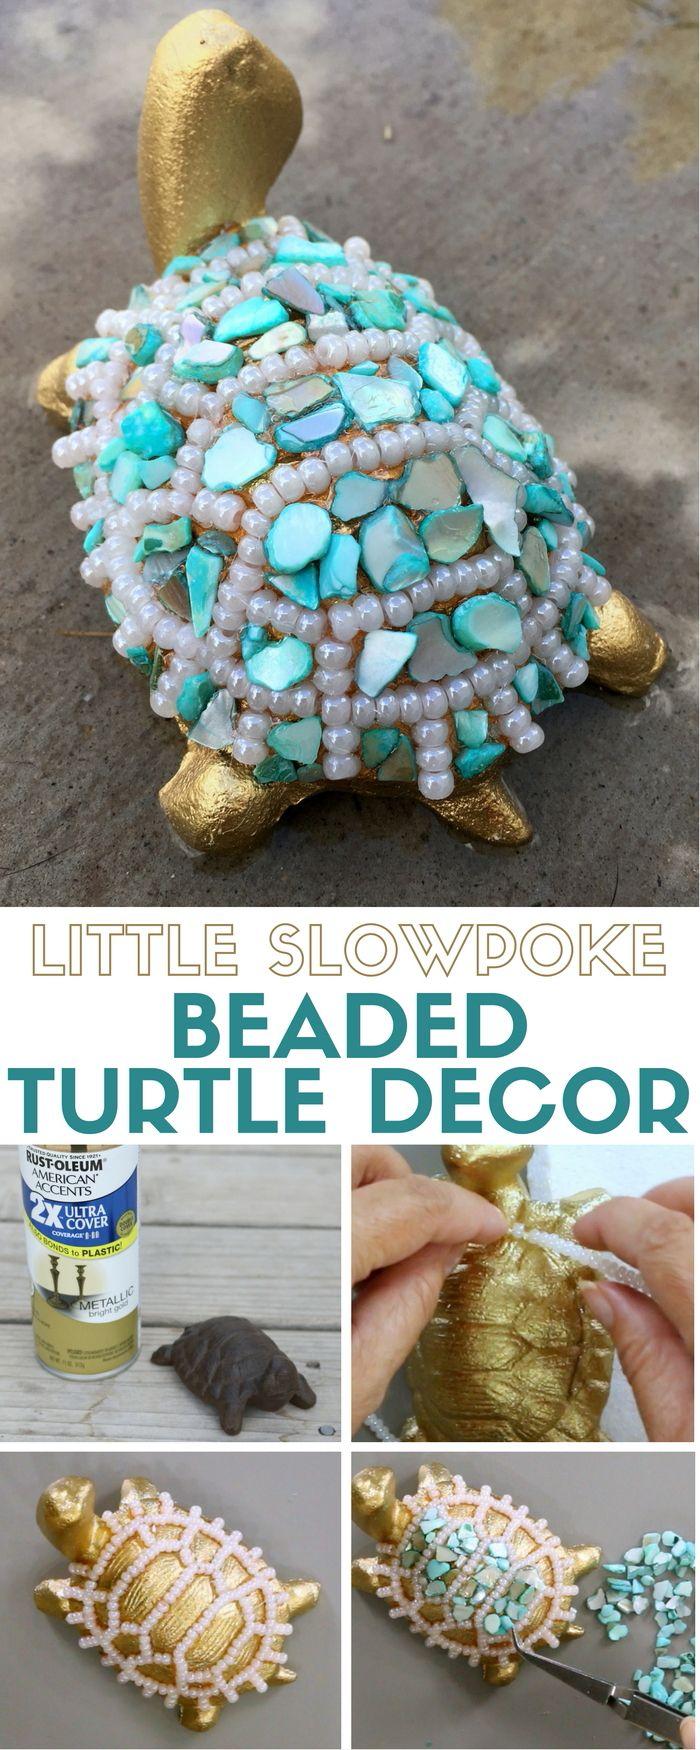 25+ best turtle decorations ideas on pinterest | under the sea